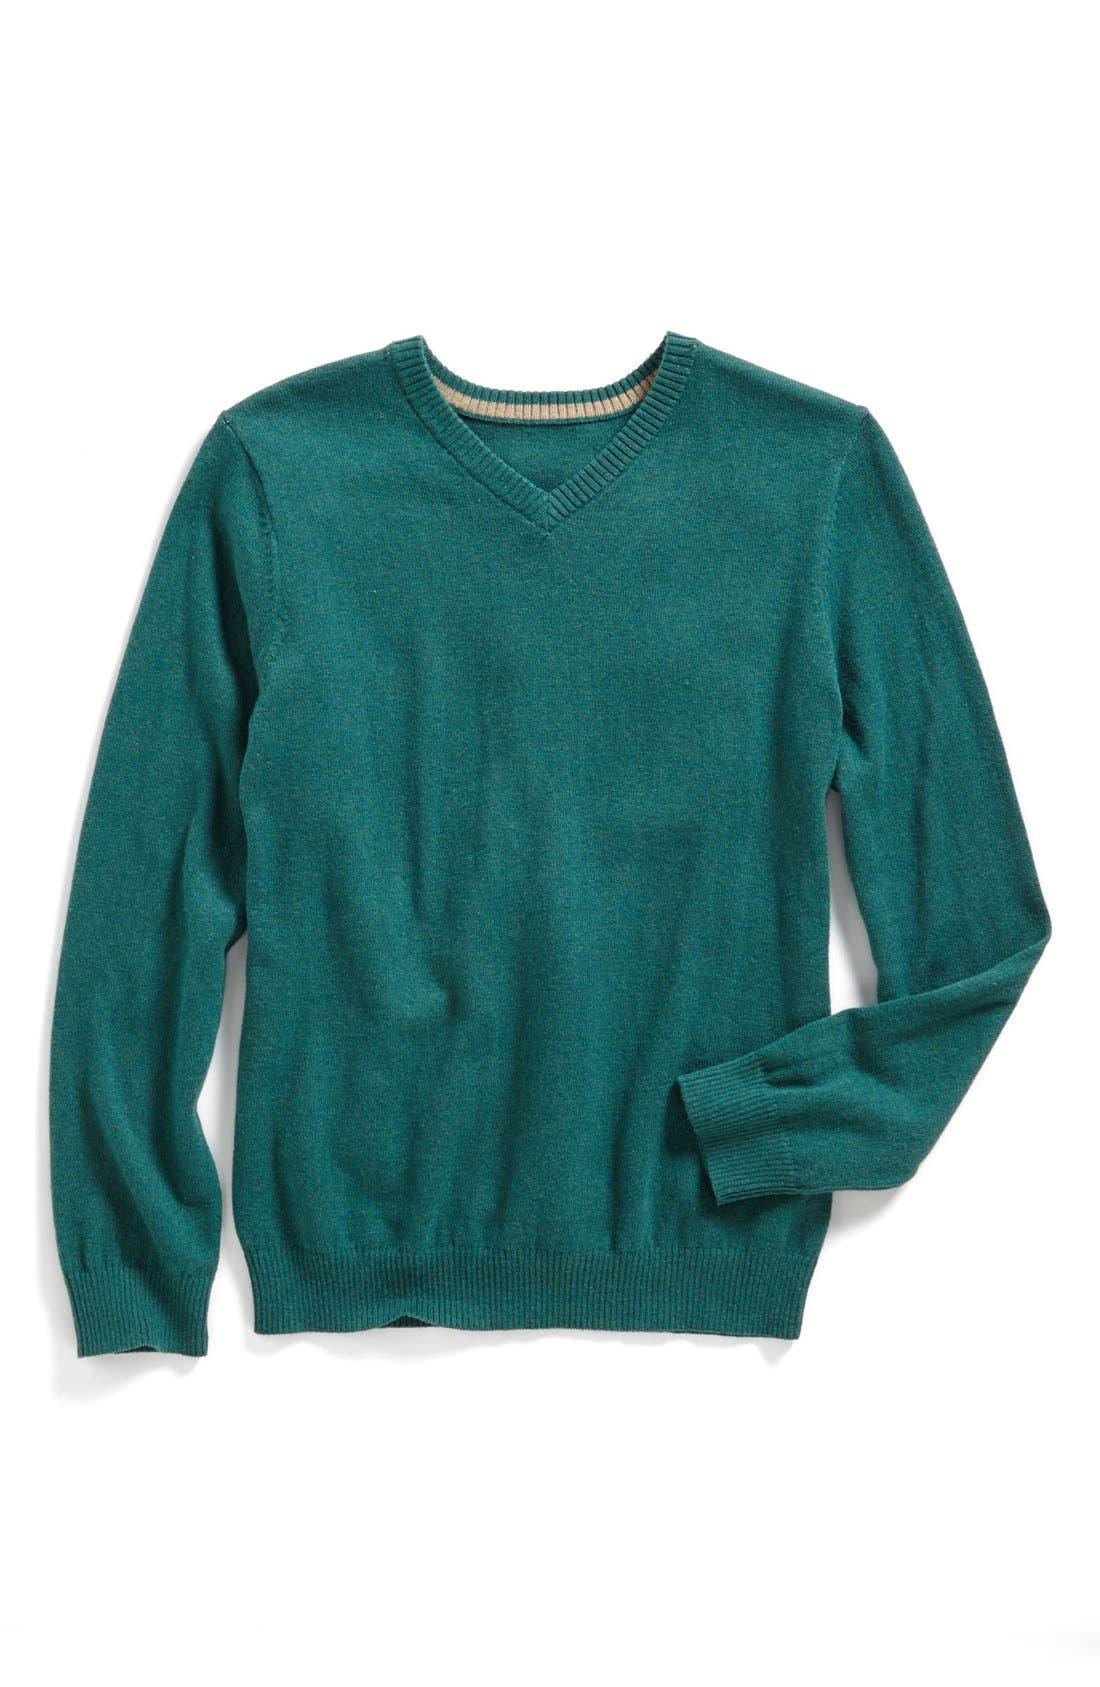 Alternate Image 1 Selected - Tucker + Tate 'Atticus' Cotton & Cashmere Sweater (Little Boys)